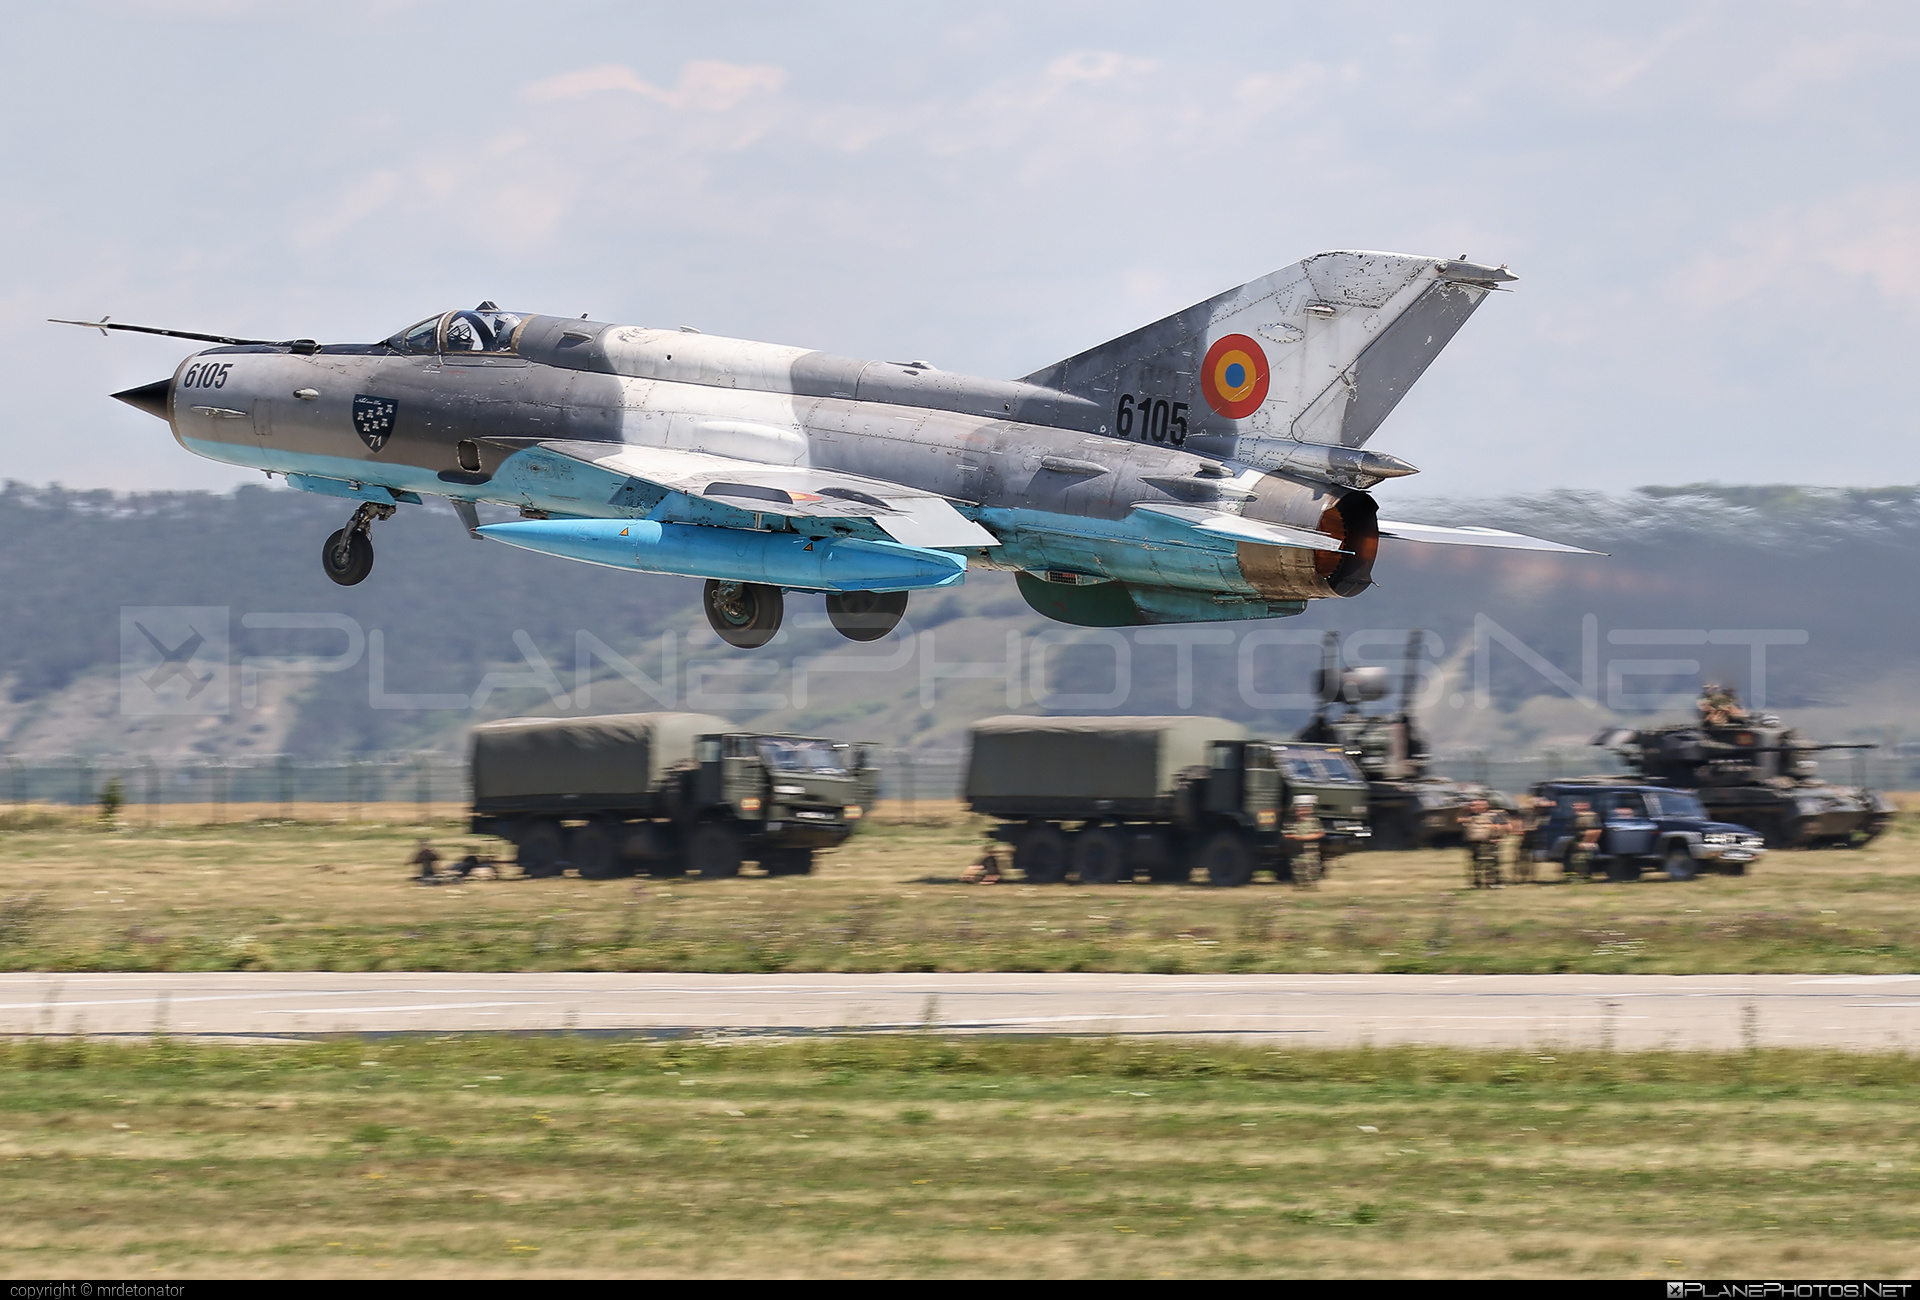 Mikoyan-Gurevich MiG-21MF - 6105 operated by Forţele Aeriene Române (Romanian Air Force) #forteleaerieneromane #mig #mig21 #mig21mf #mikoyangurevich #romanianairforce